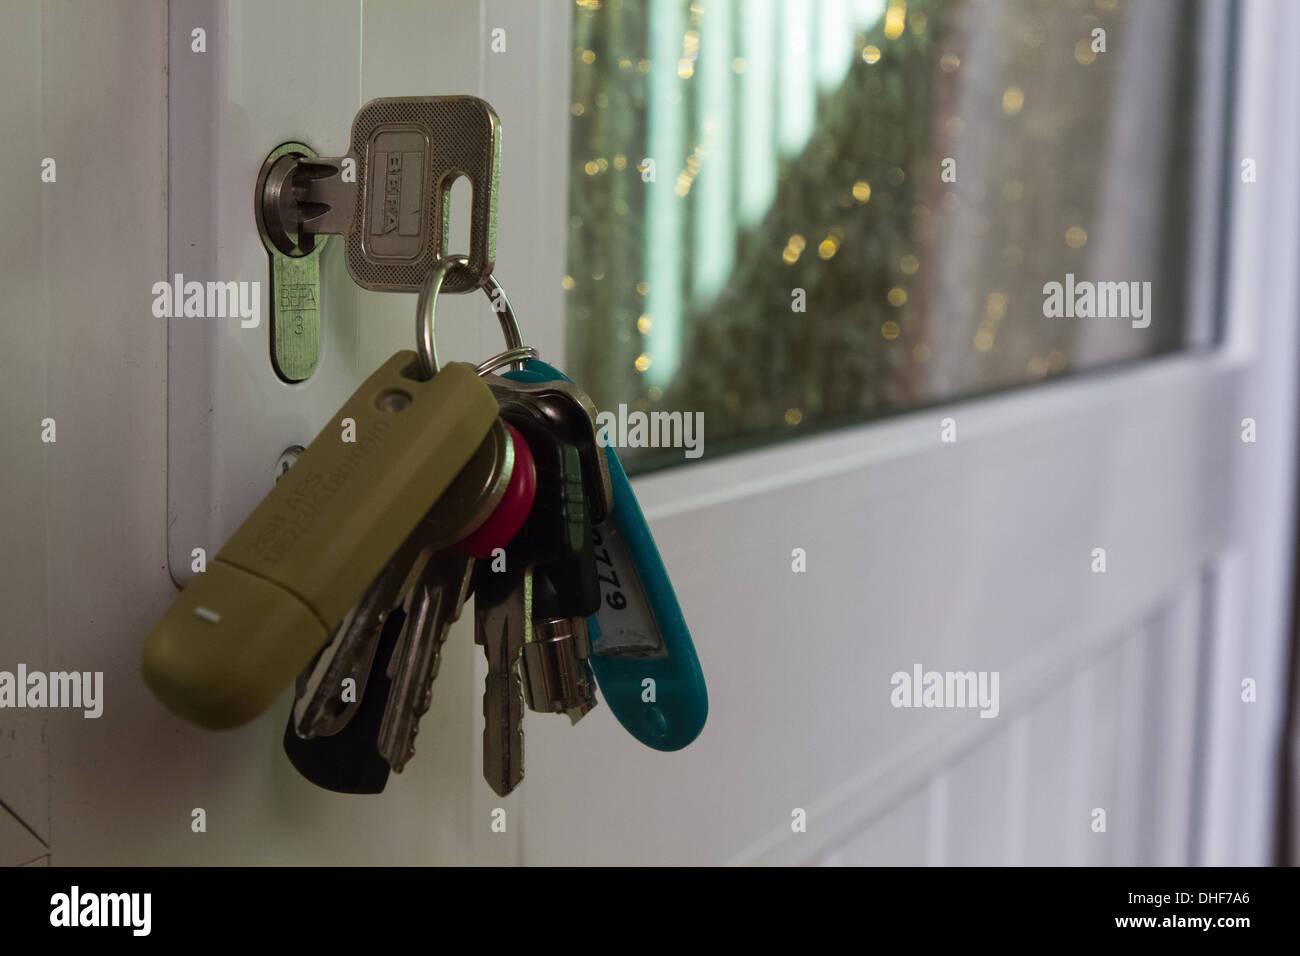 Porte clés Photo Stock